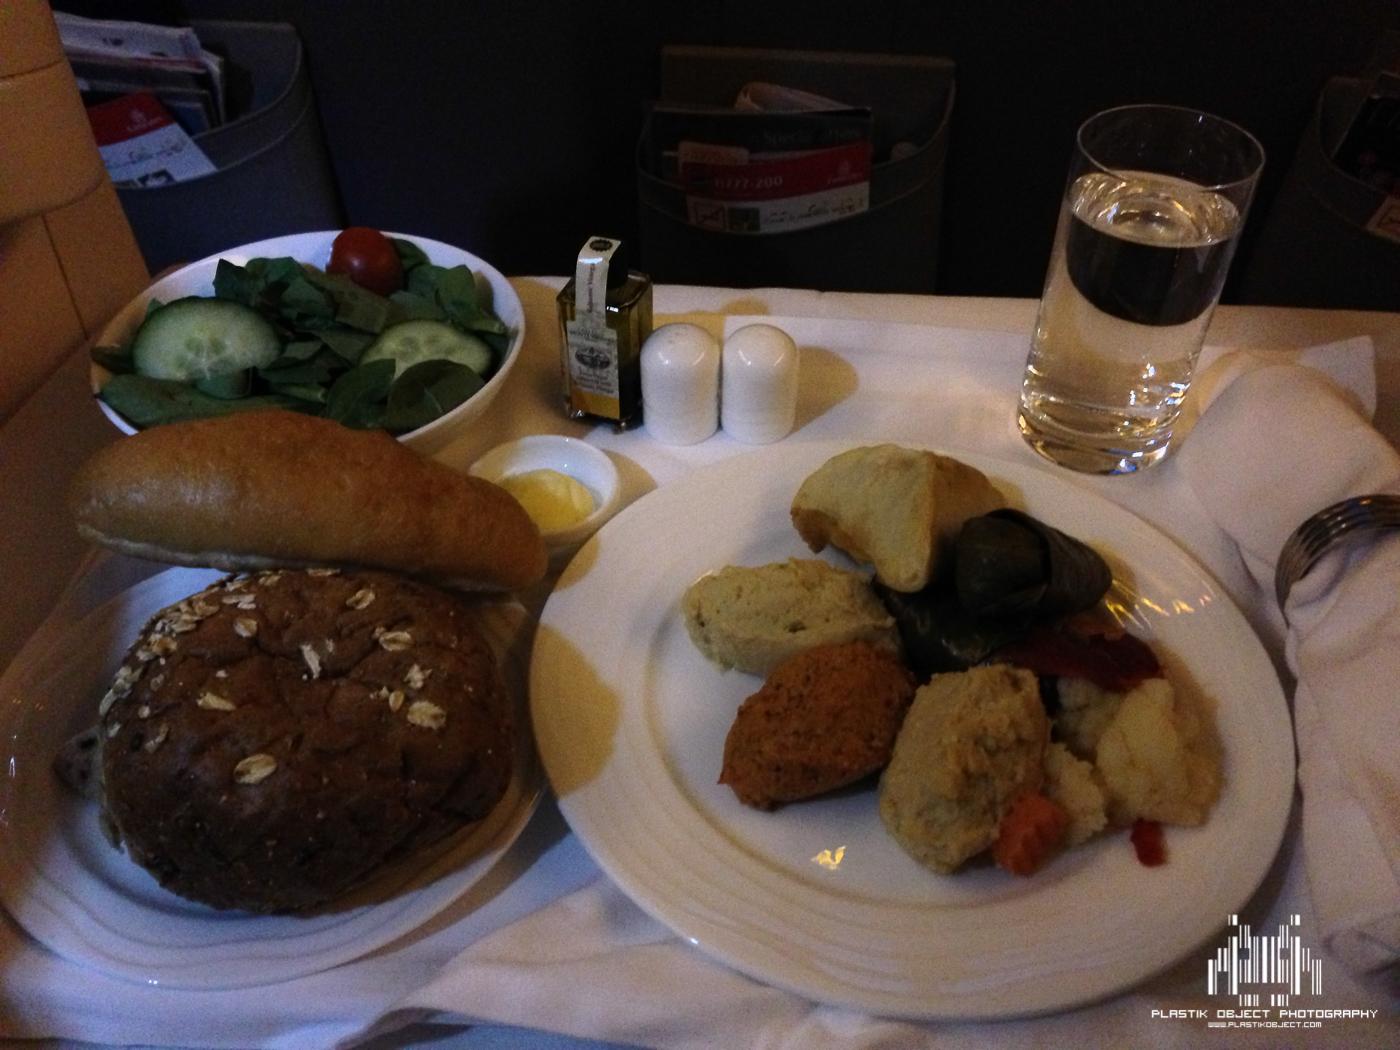 Dinner - Iphone photo